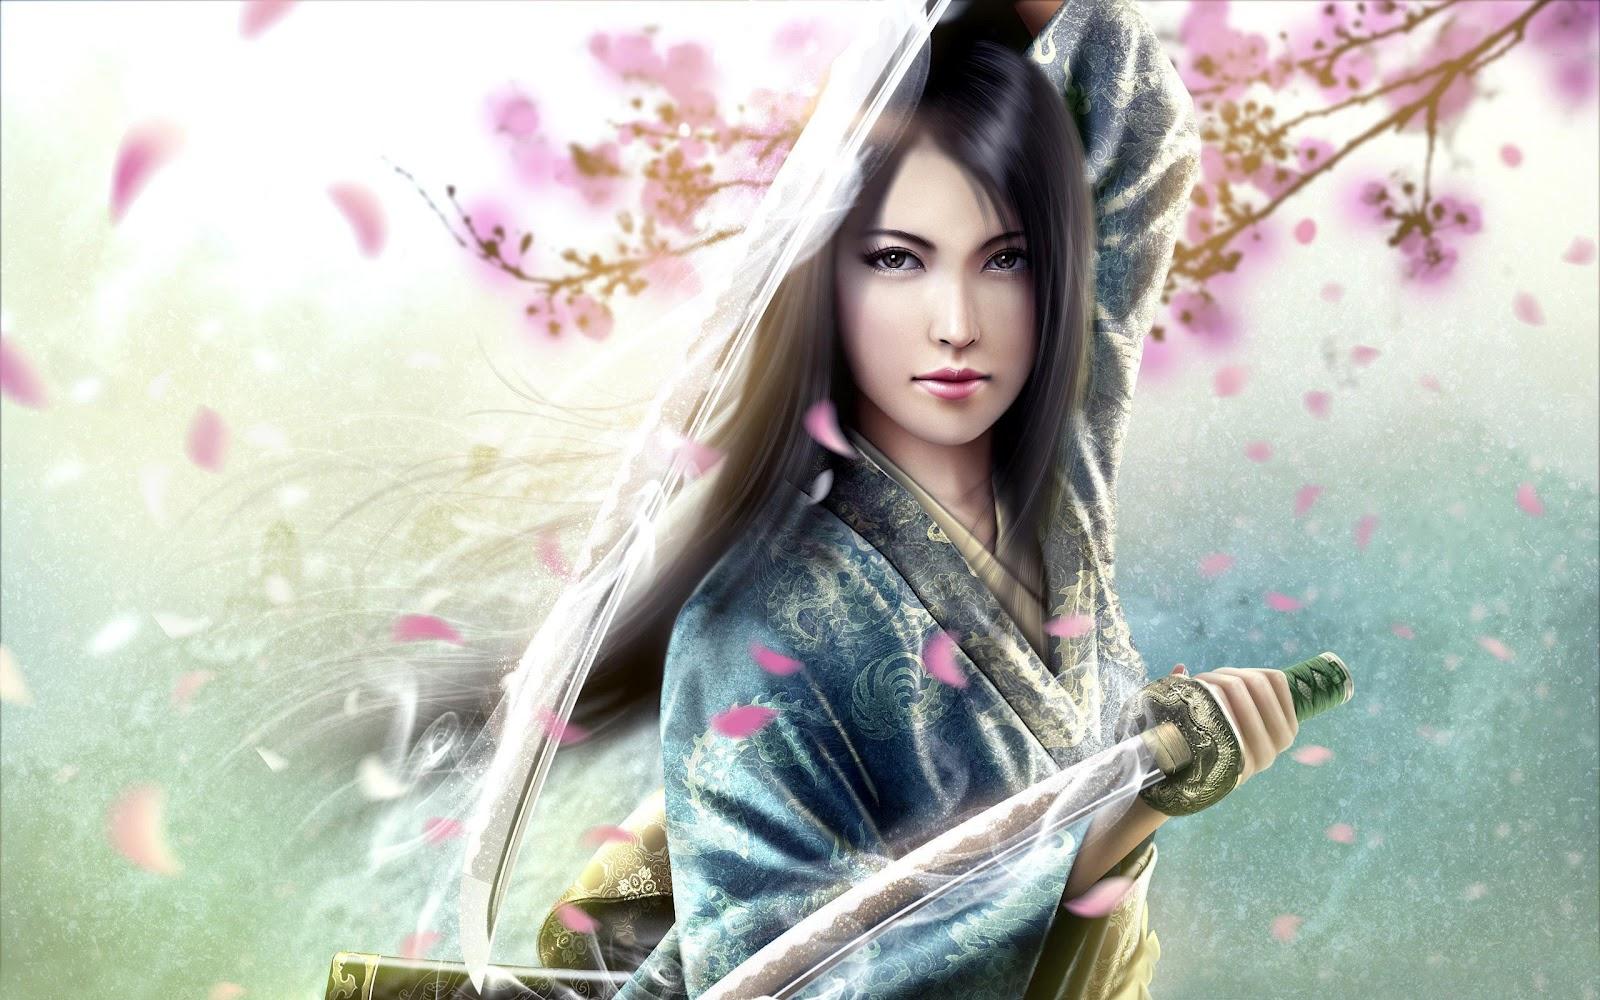 Samurai Girl Hd Wallpapers 8316 Wallpaper 1600x1000